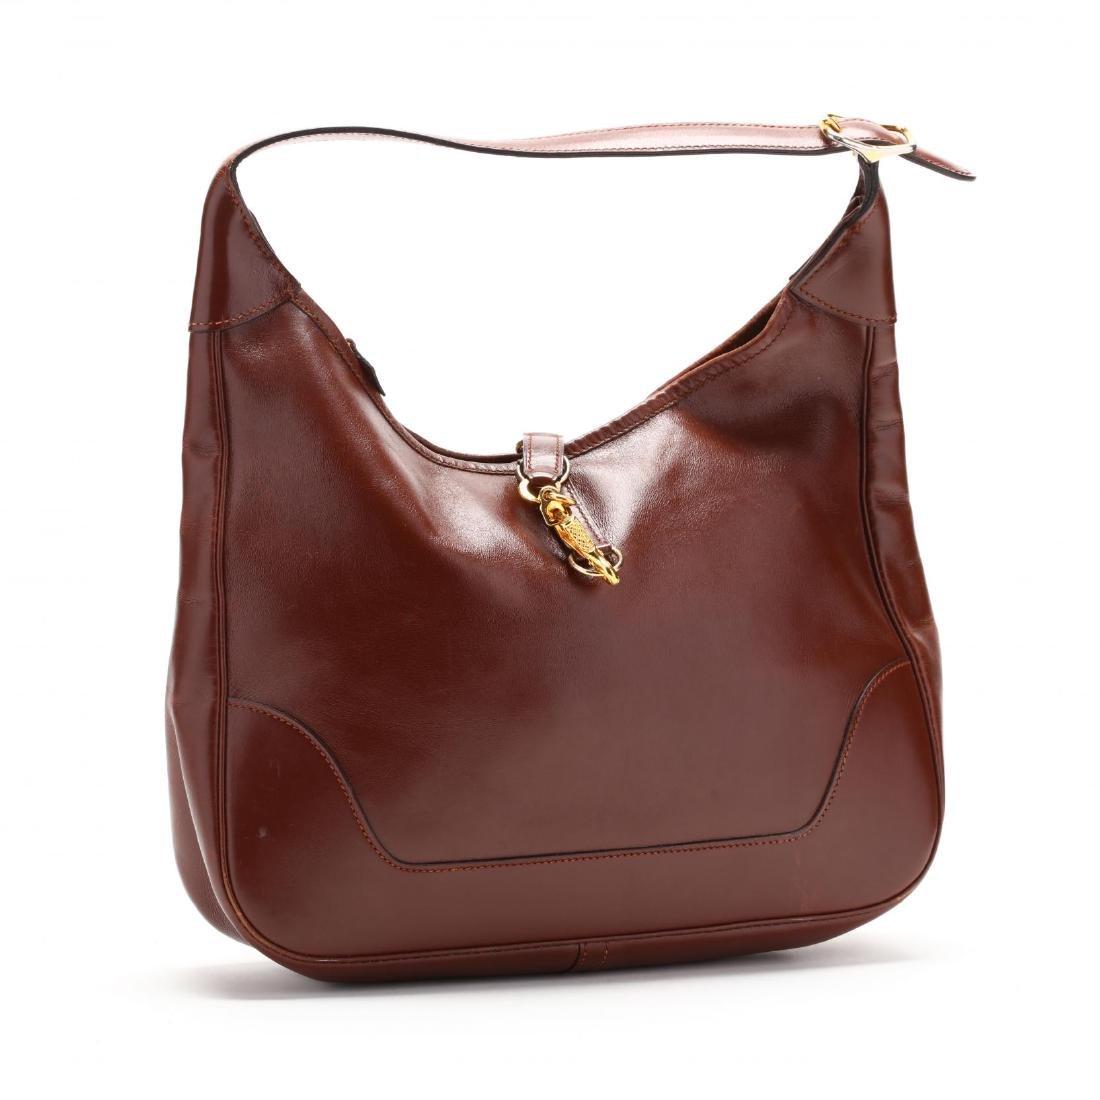 A Satchel Box Handbag,  Trim I  , Hermès